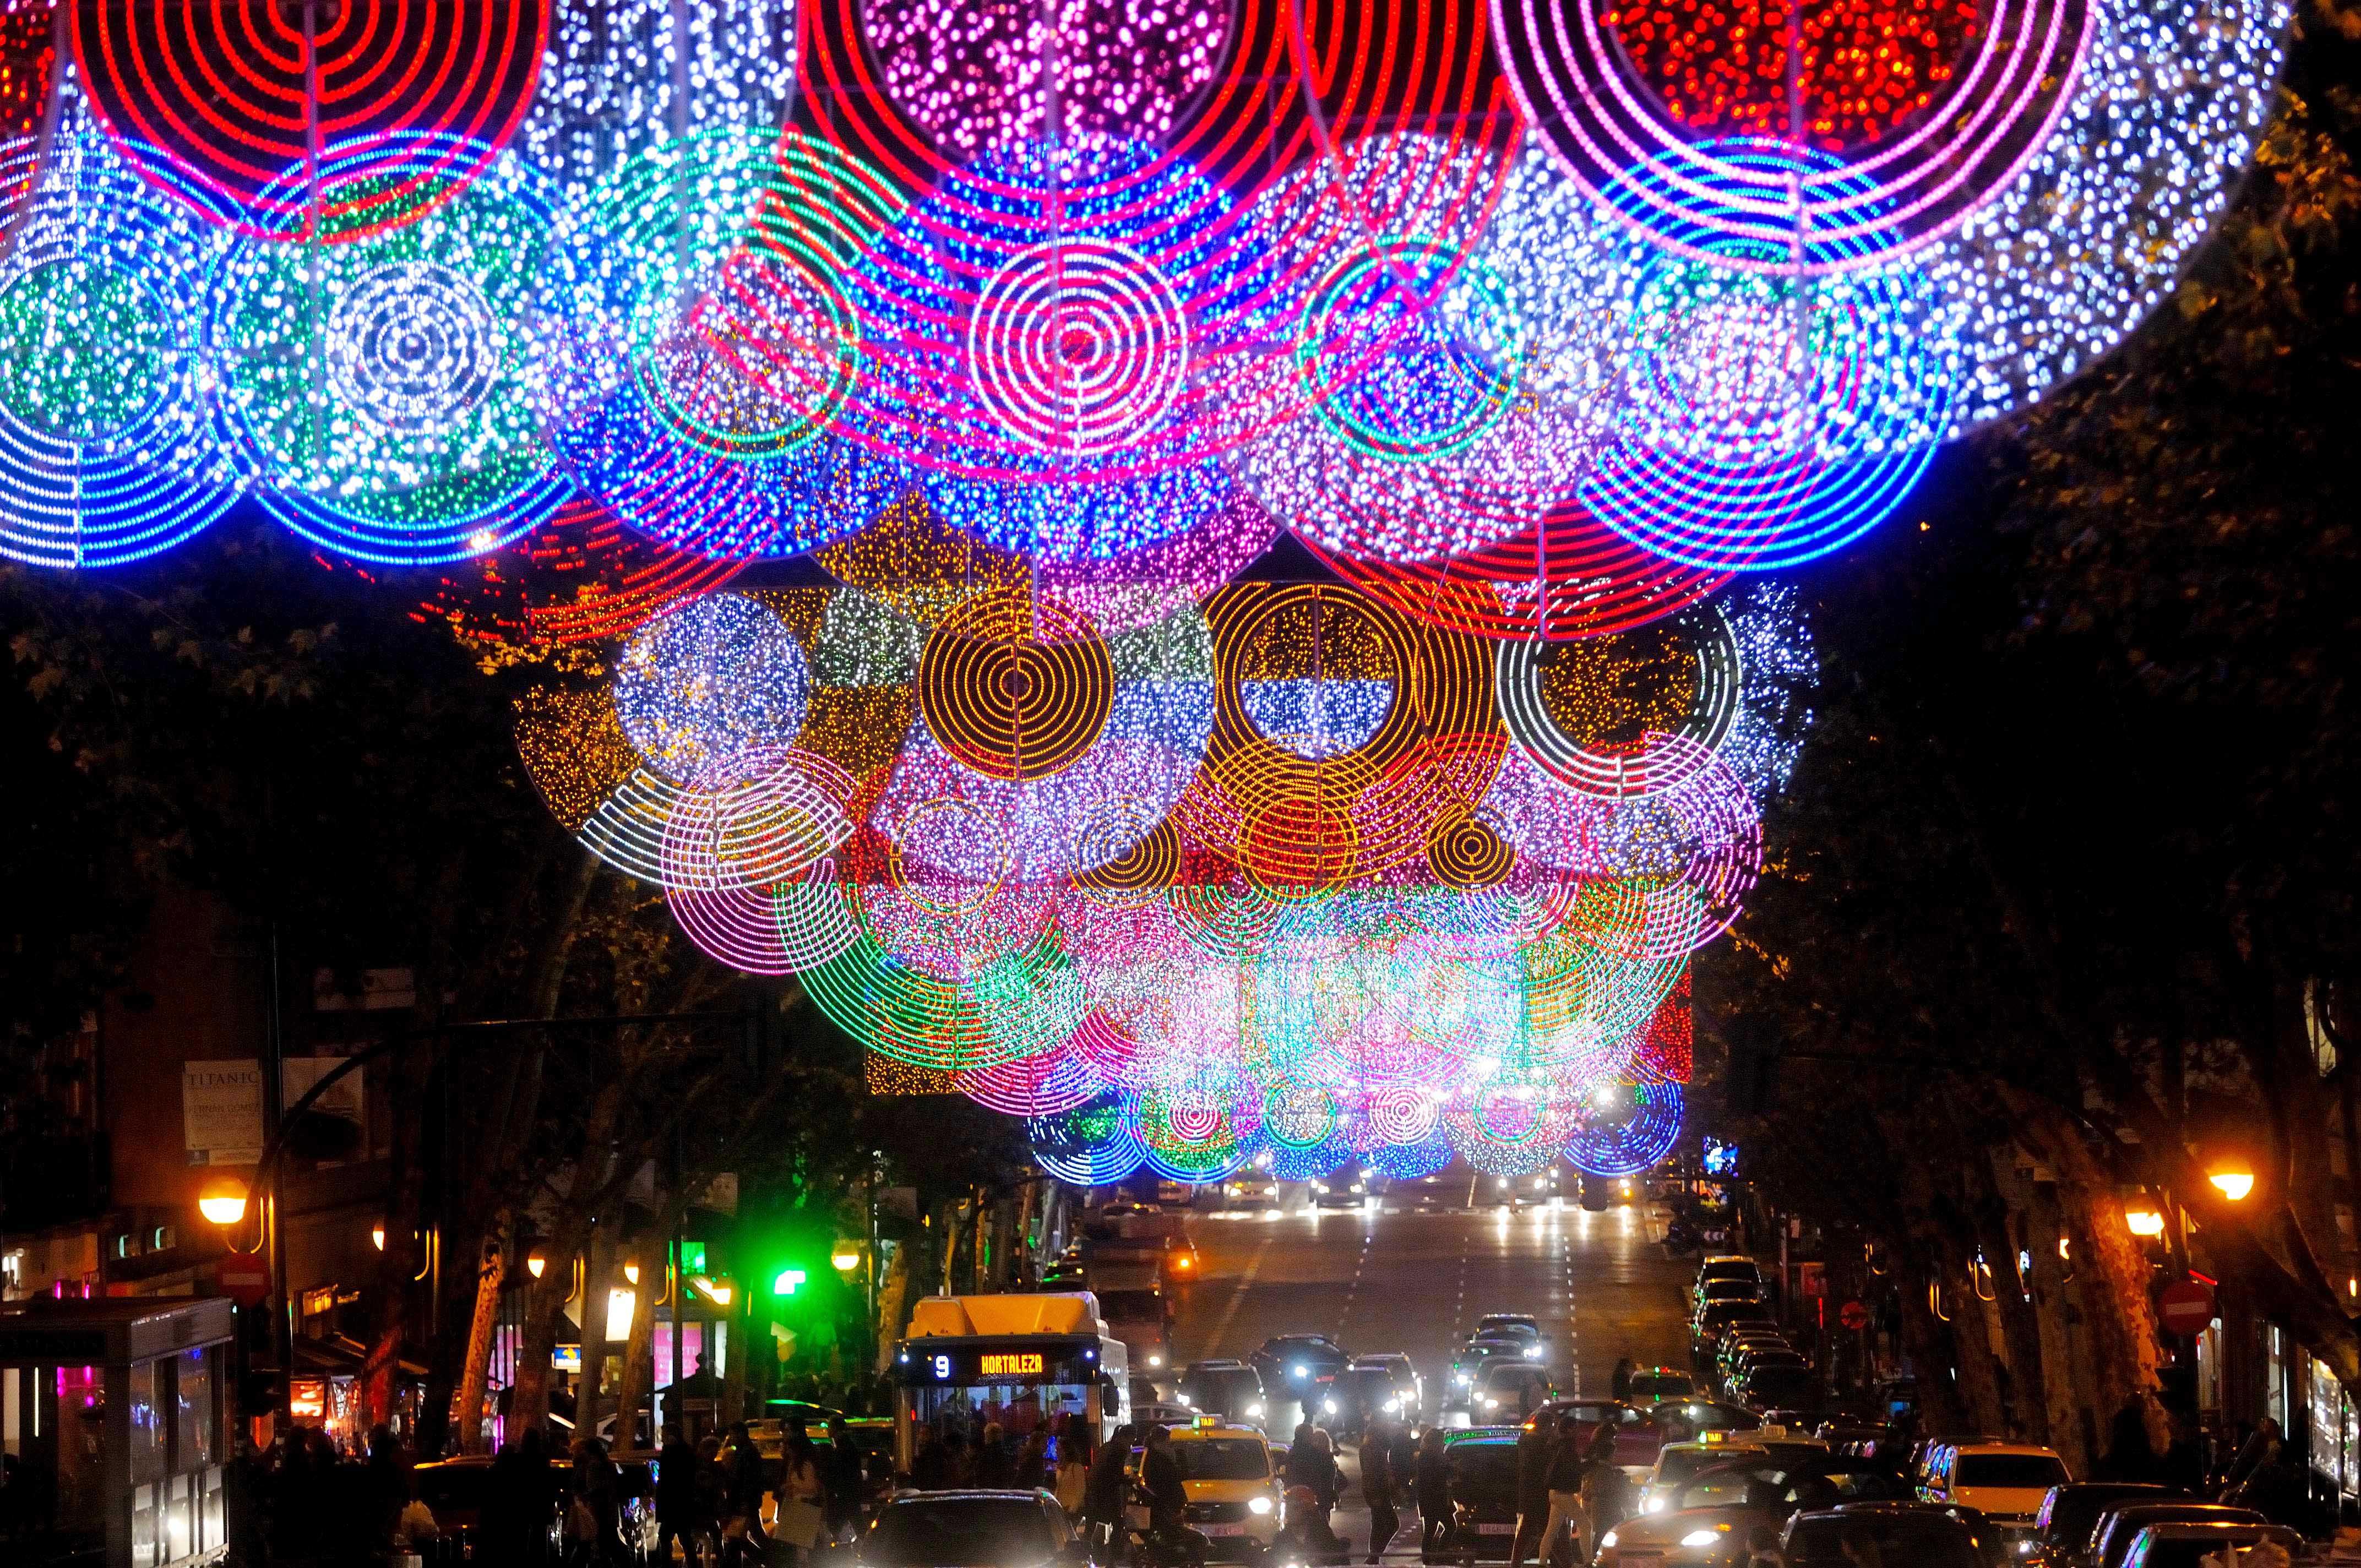 c6b573ac3eb Madrid ilumina sus calles por Navidad - Ayuntamiento de Madrid